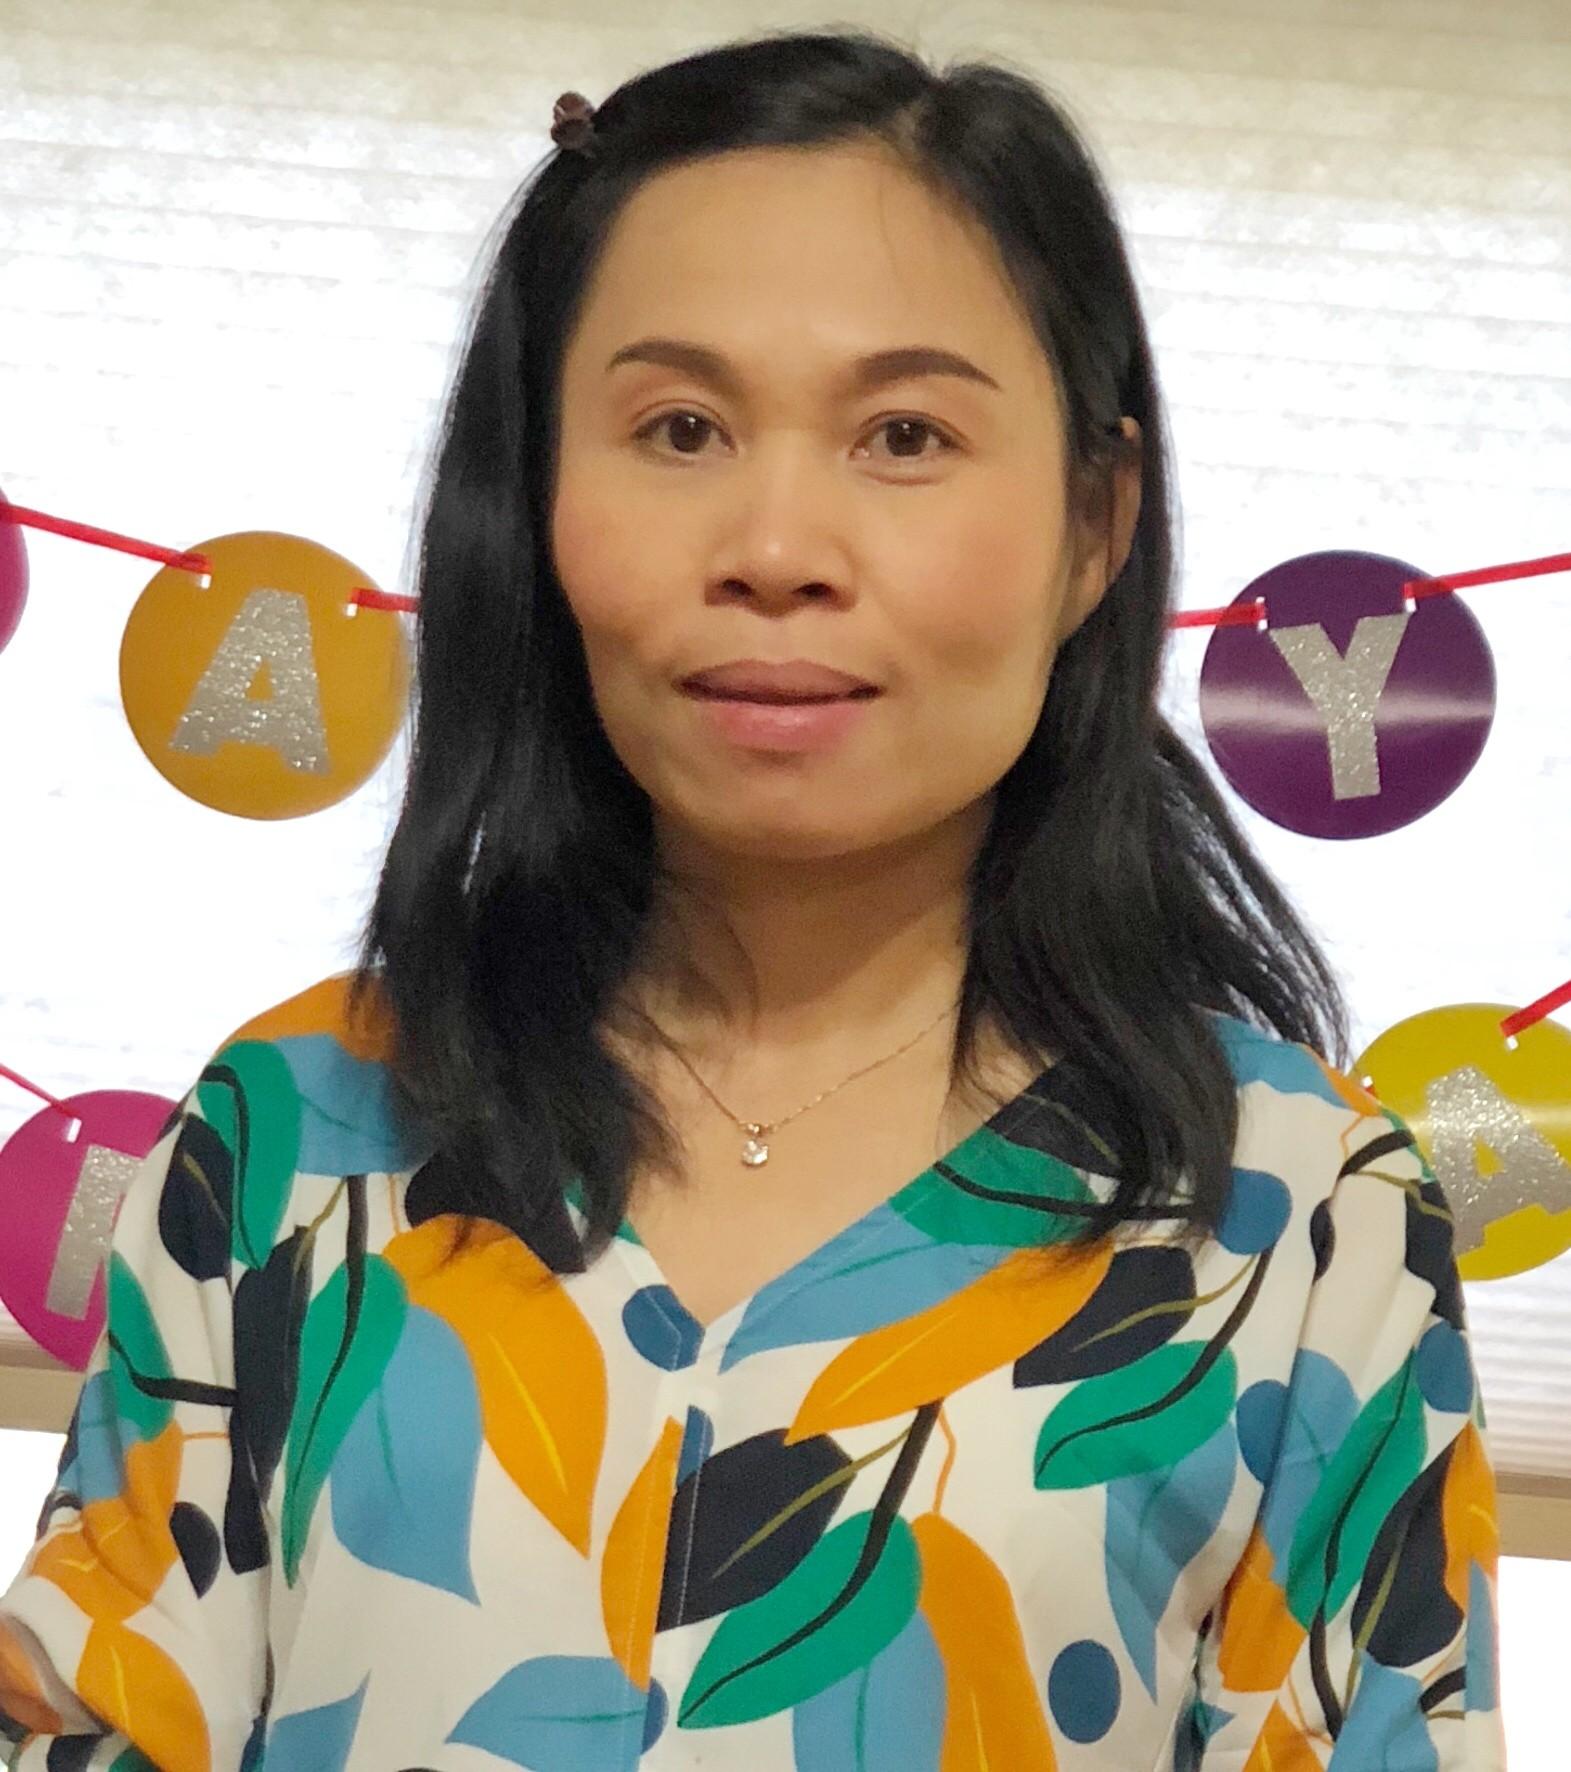 Trang Vo